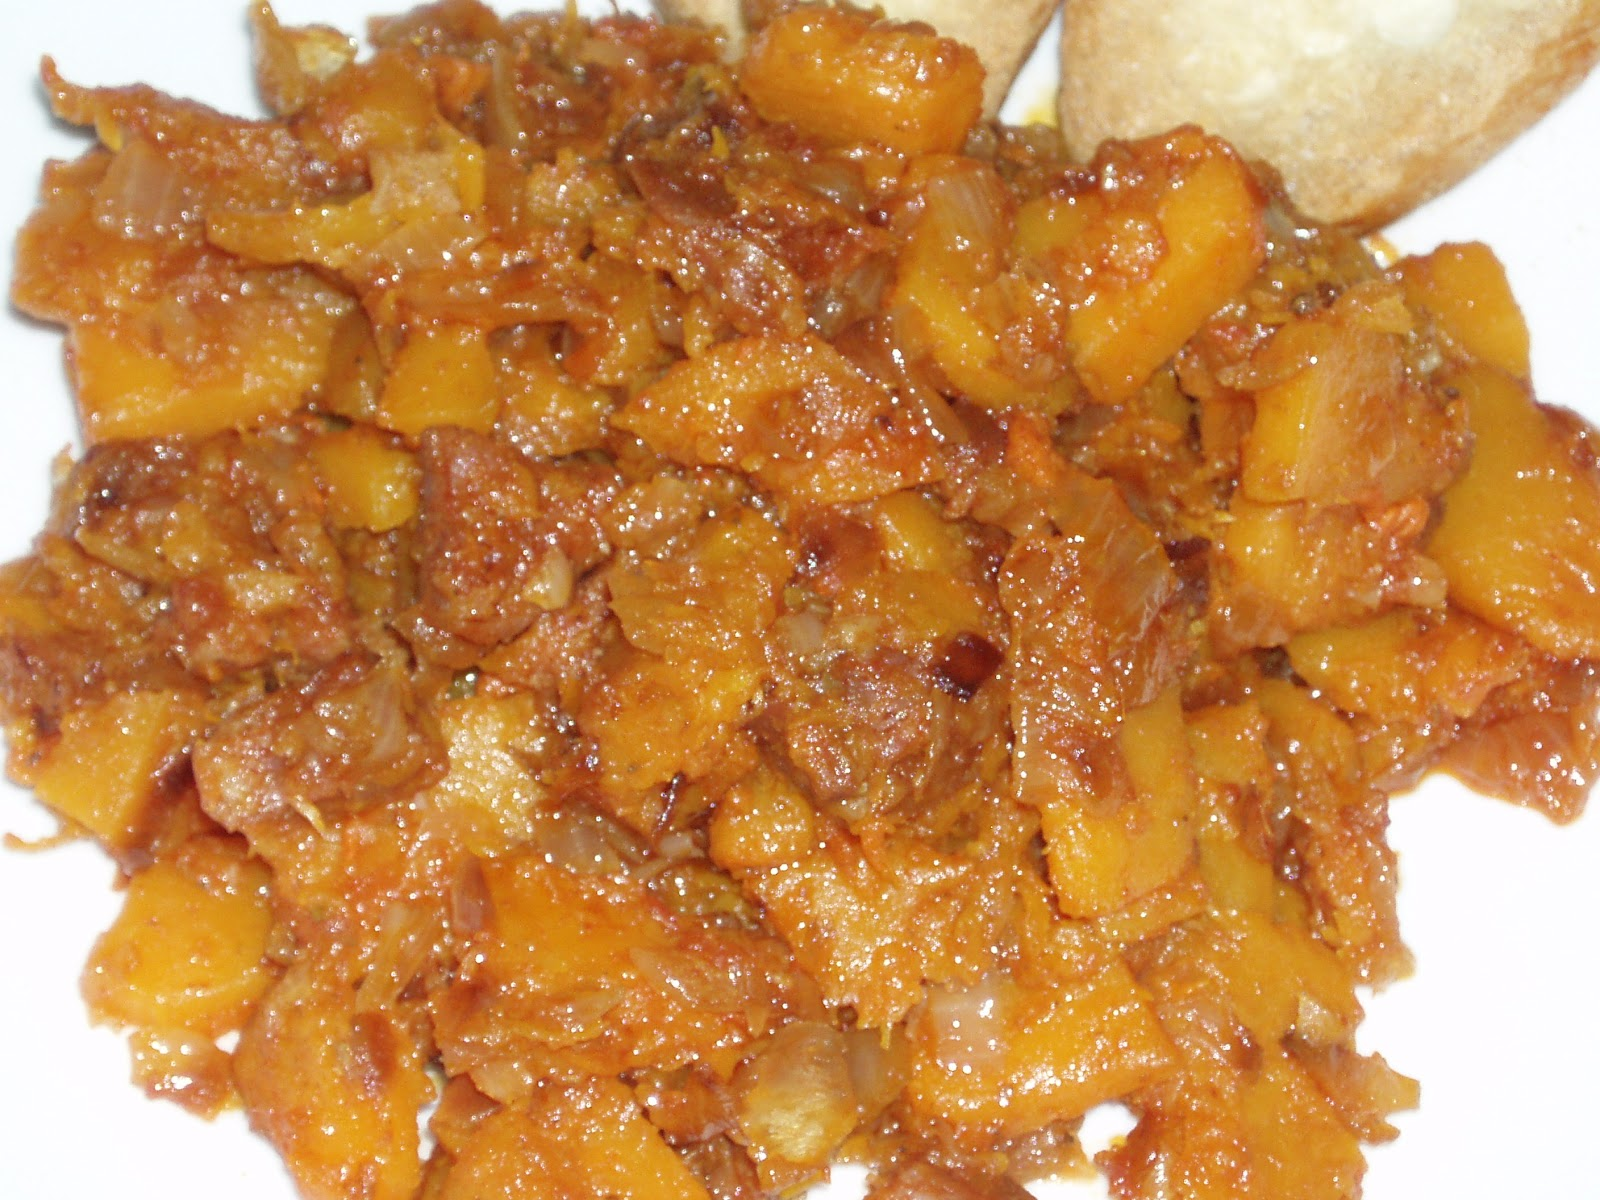 Al alim n calabaza frita for Calabaza frita